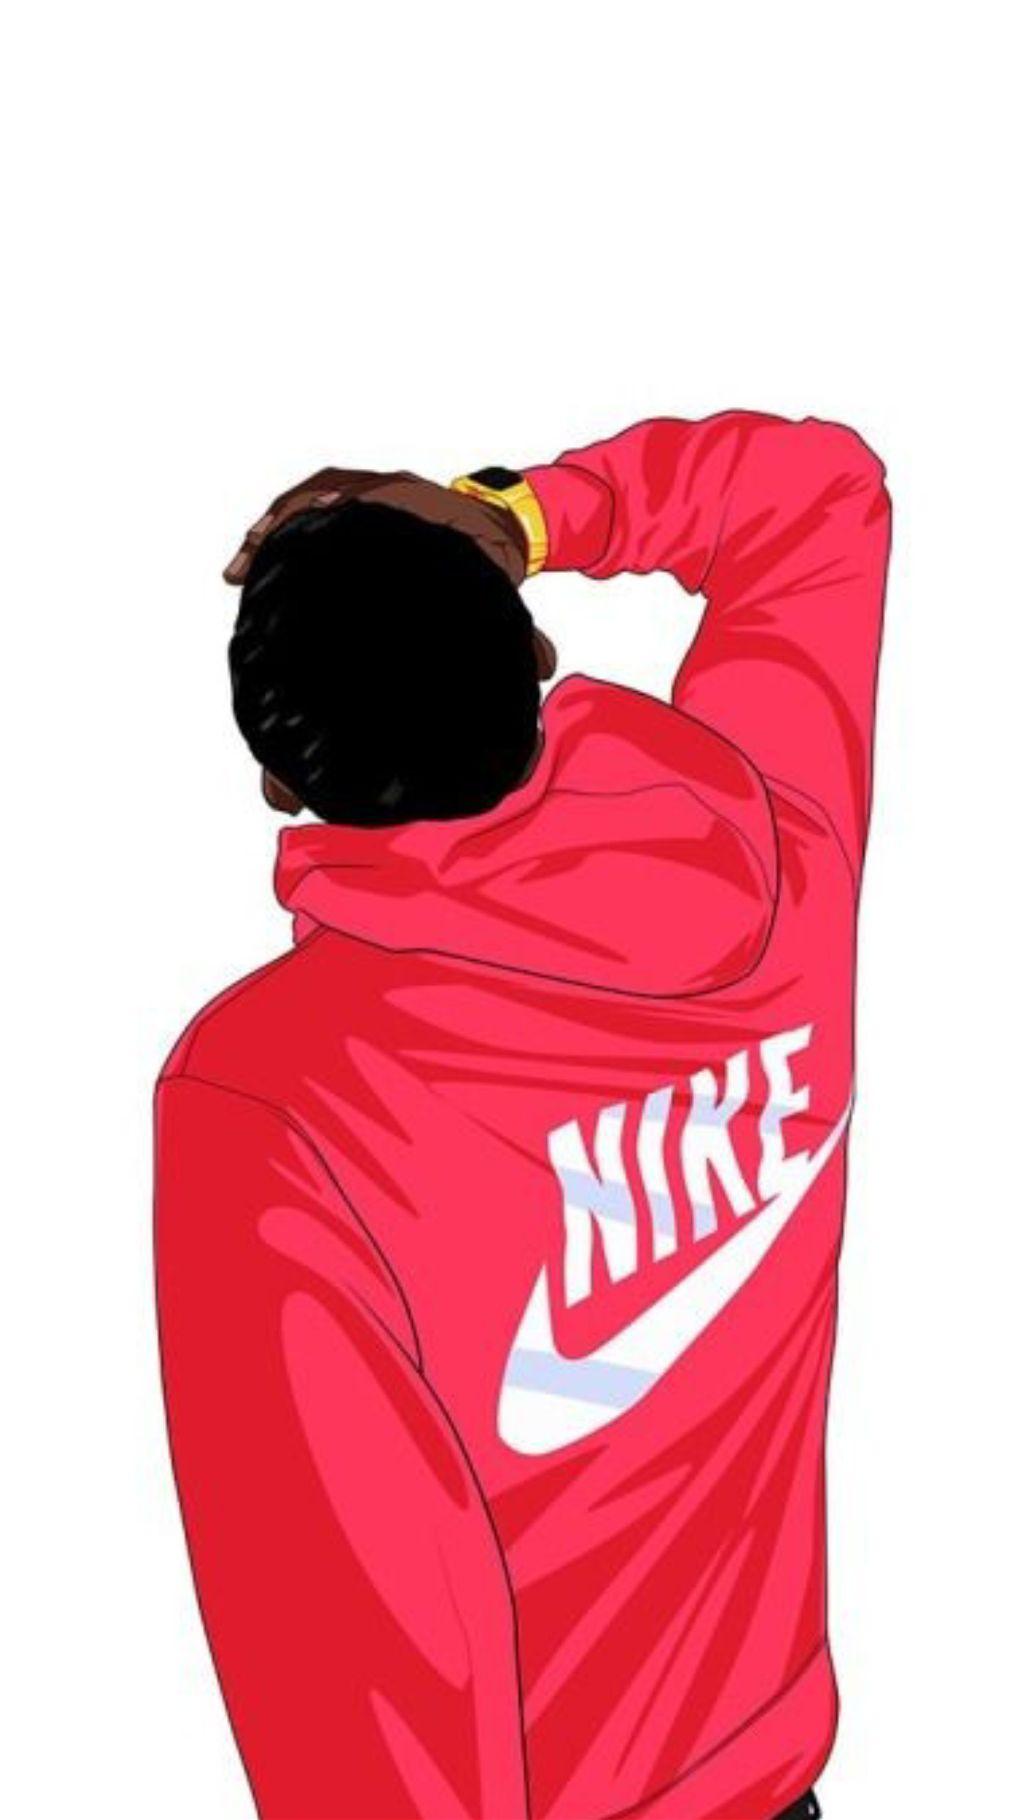 Wallpapers Nike Boy Wallpaper